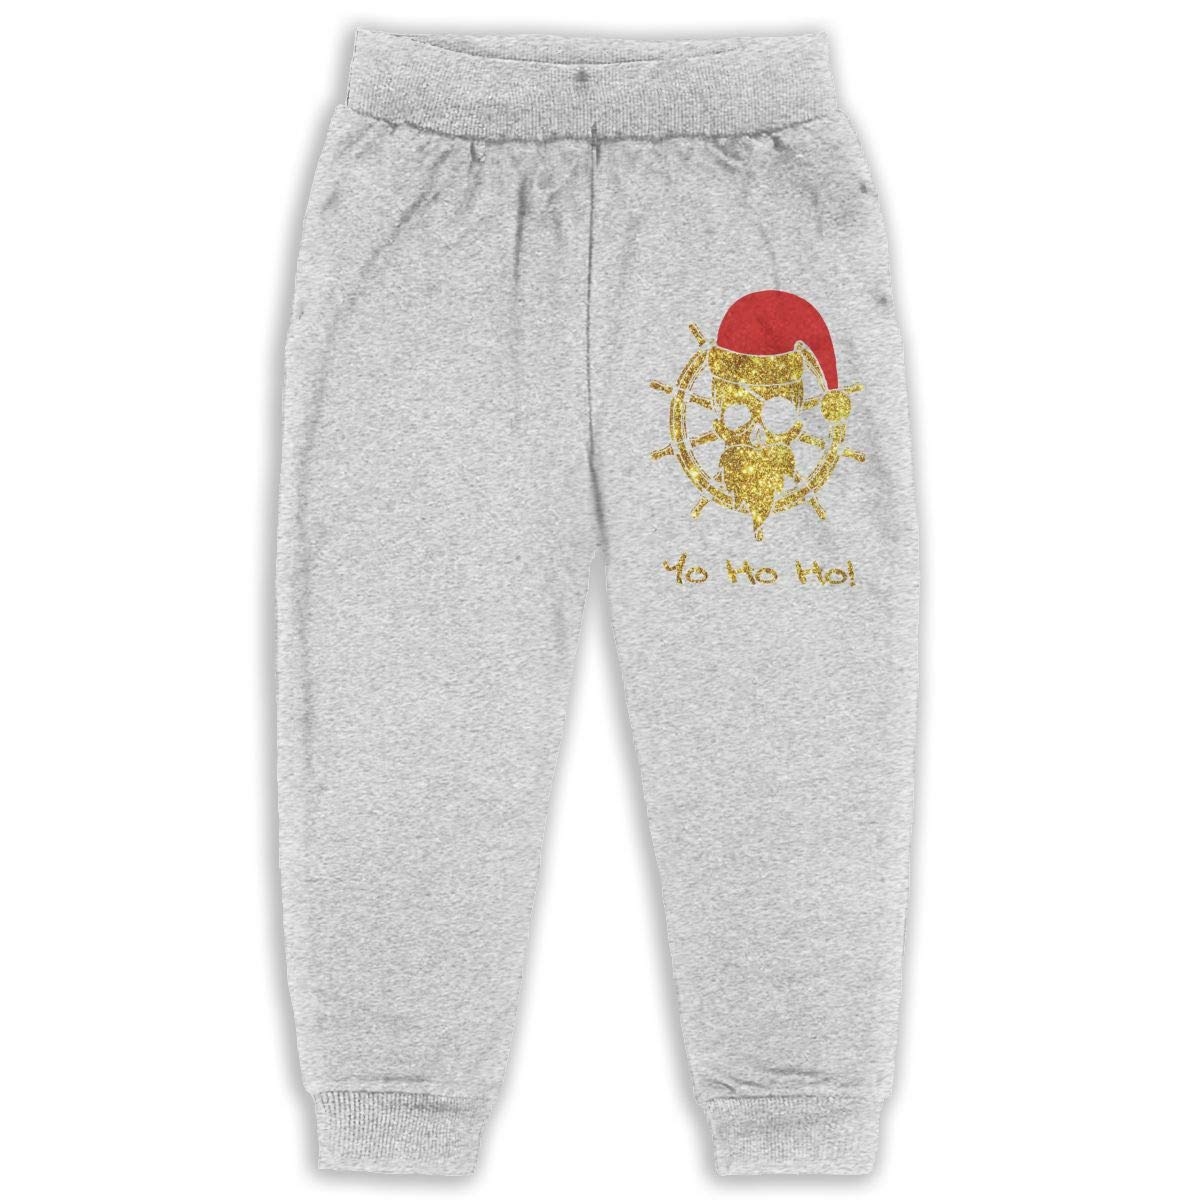 Laoyaotequ Pirate Santa Funny Christmas Pirates Kids Cotton Sweatpants,Jogger Long Jersey Sweatpants